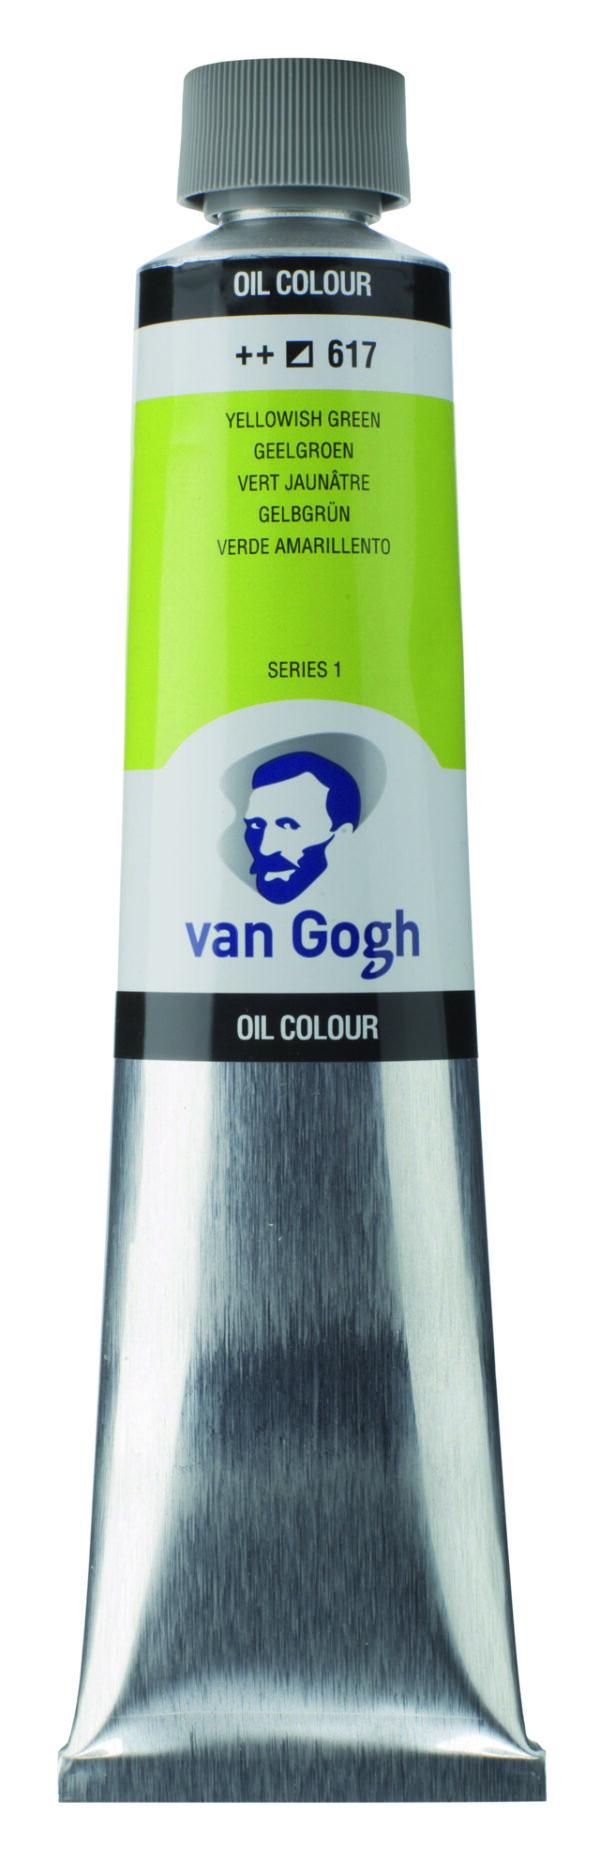 Van Gogh 617 Yellowish green - 200 ml